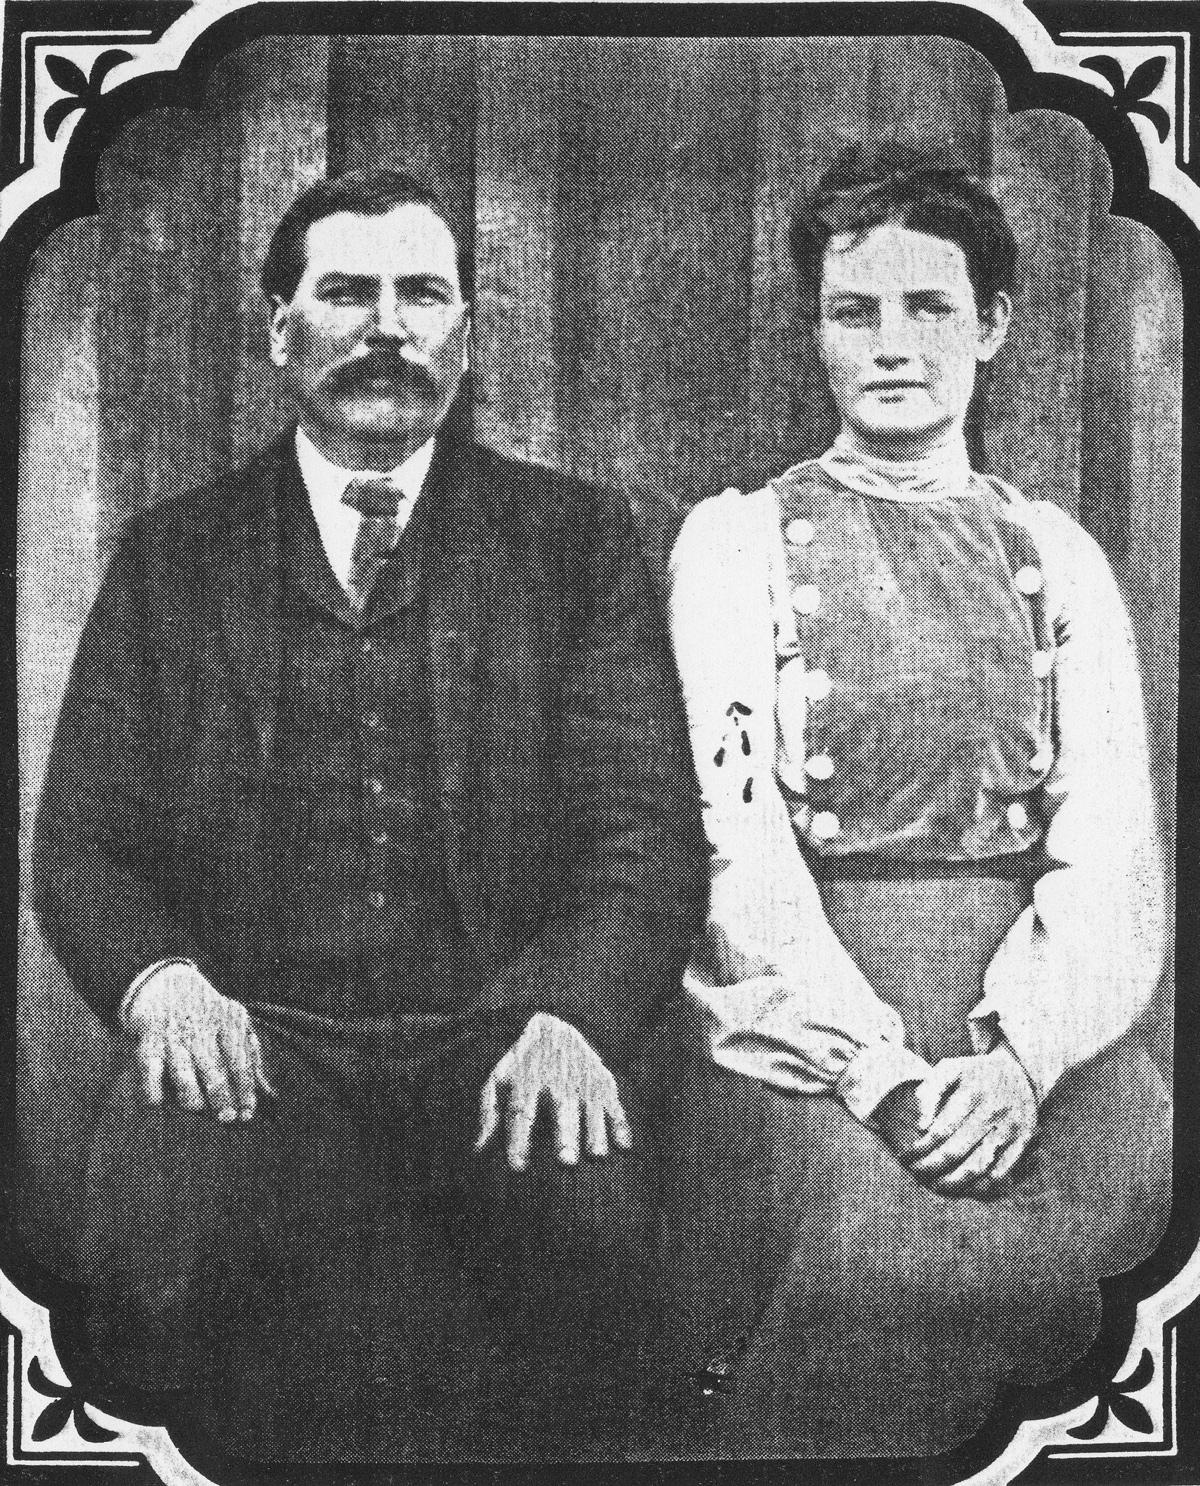 Will Purvis (trái) cùng vợ. Ảnh: Find a Grave.